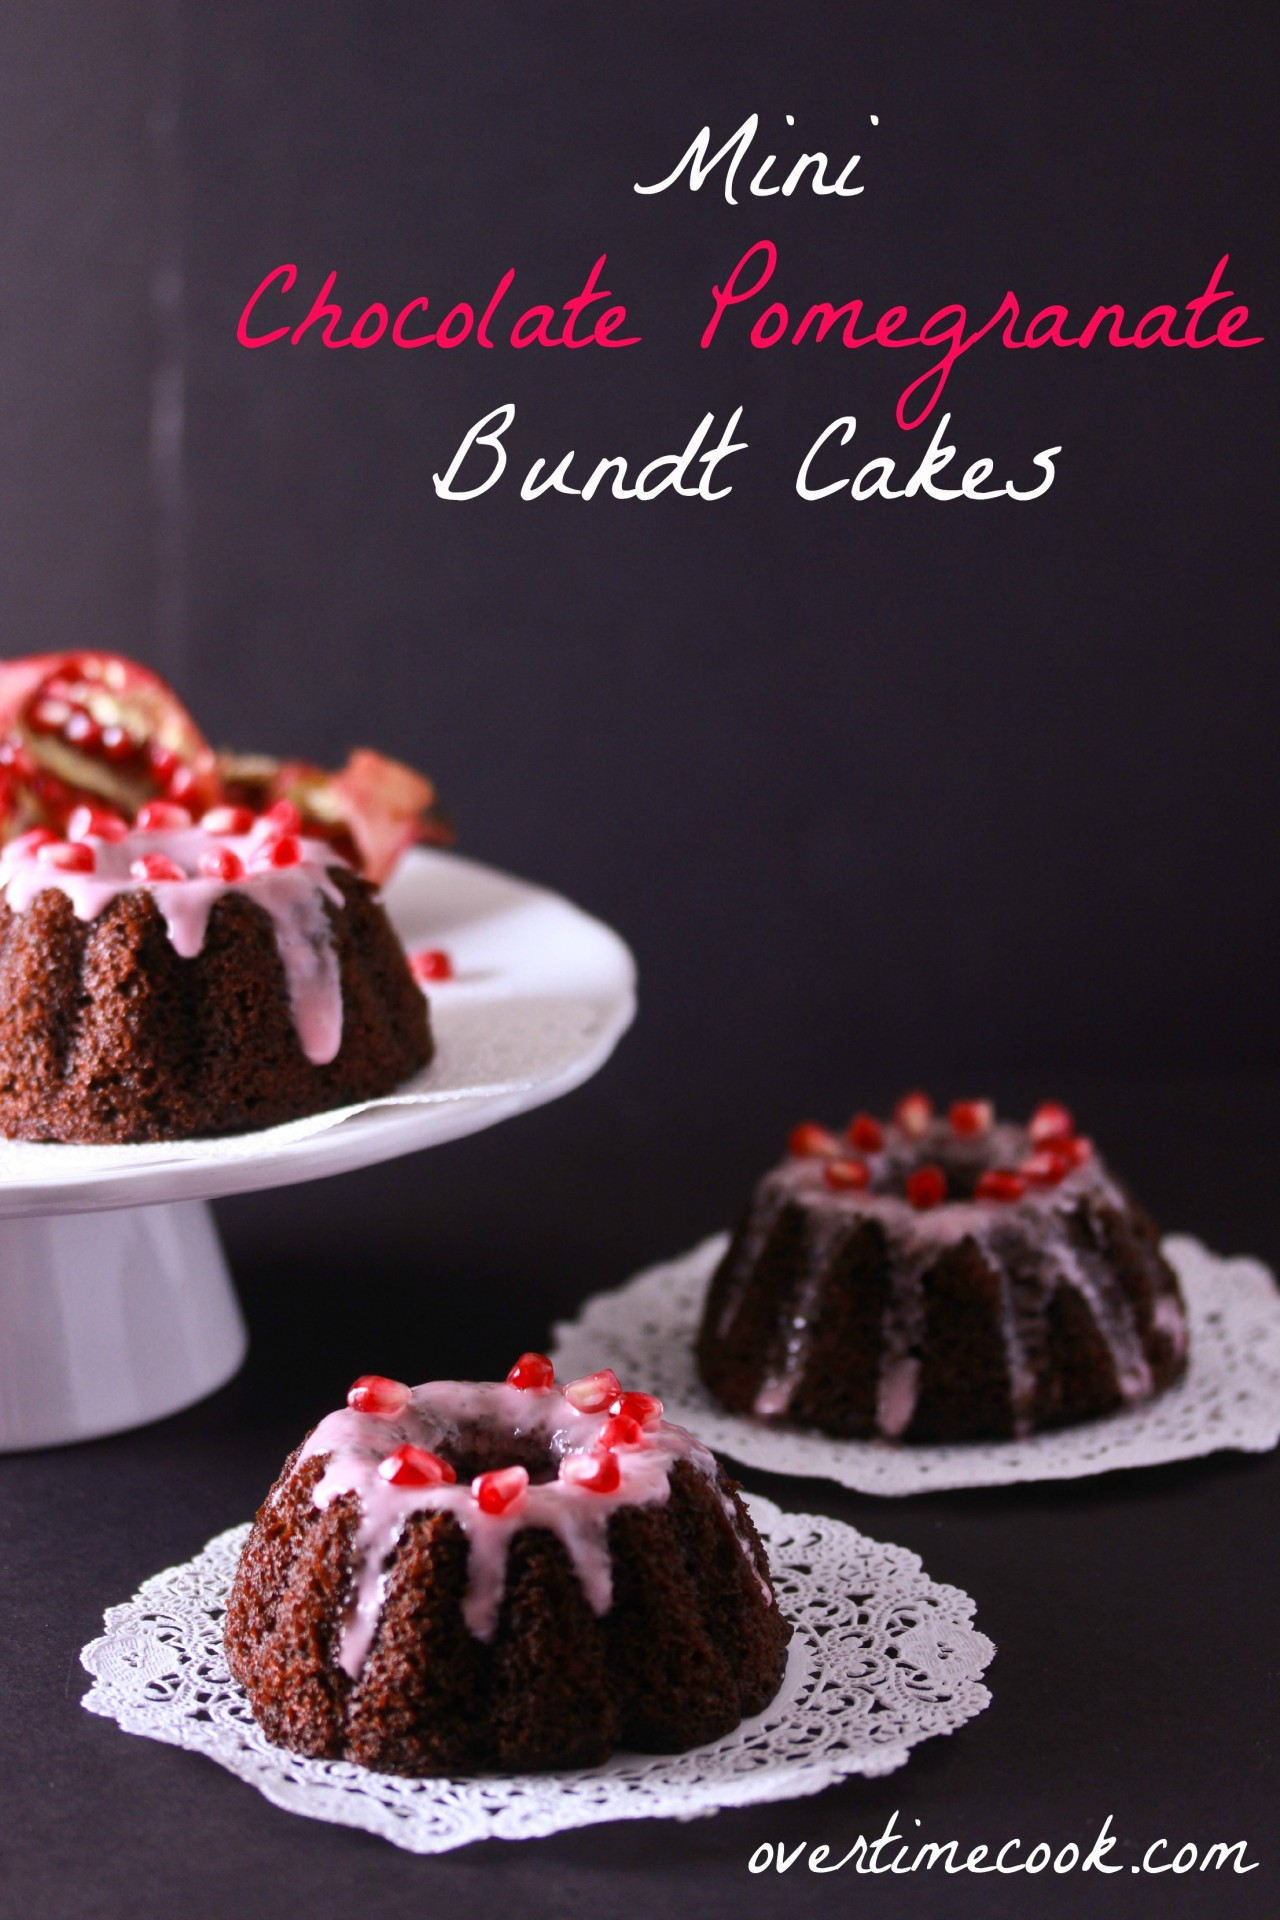 Mini Chocolate Pomegranate Bundt Cakes With Pomegranate